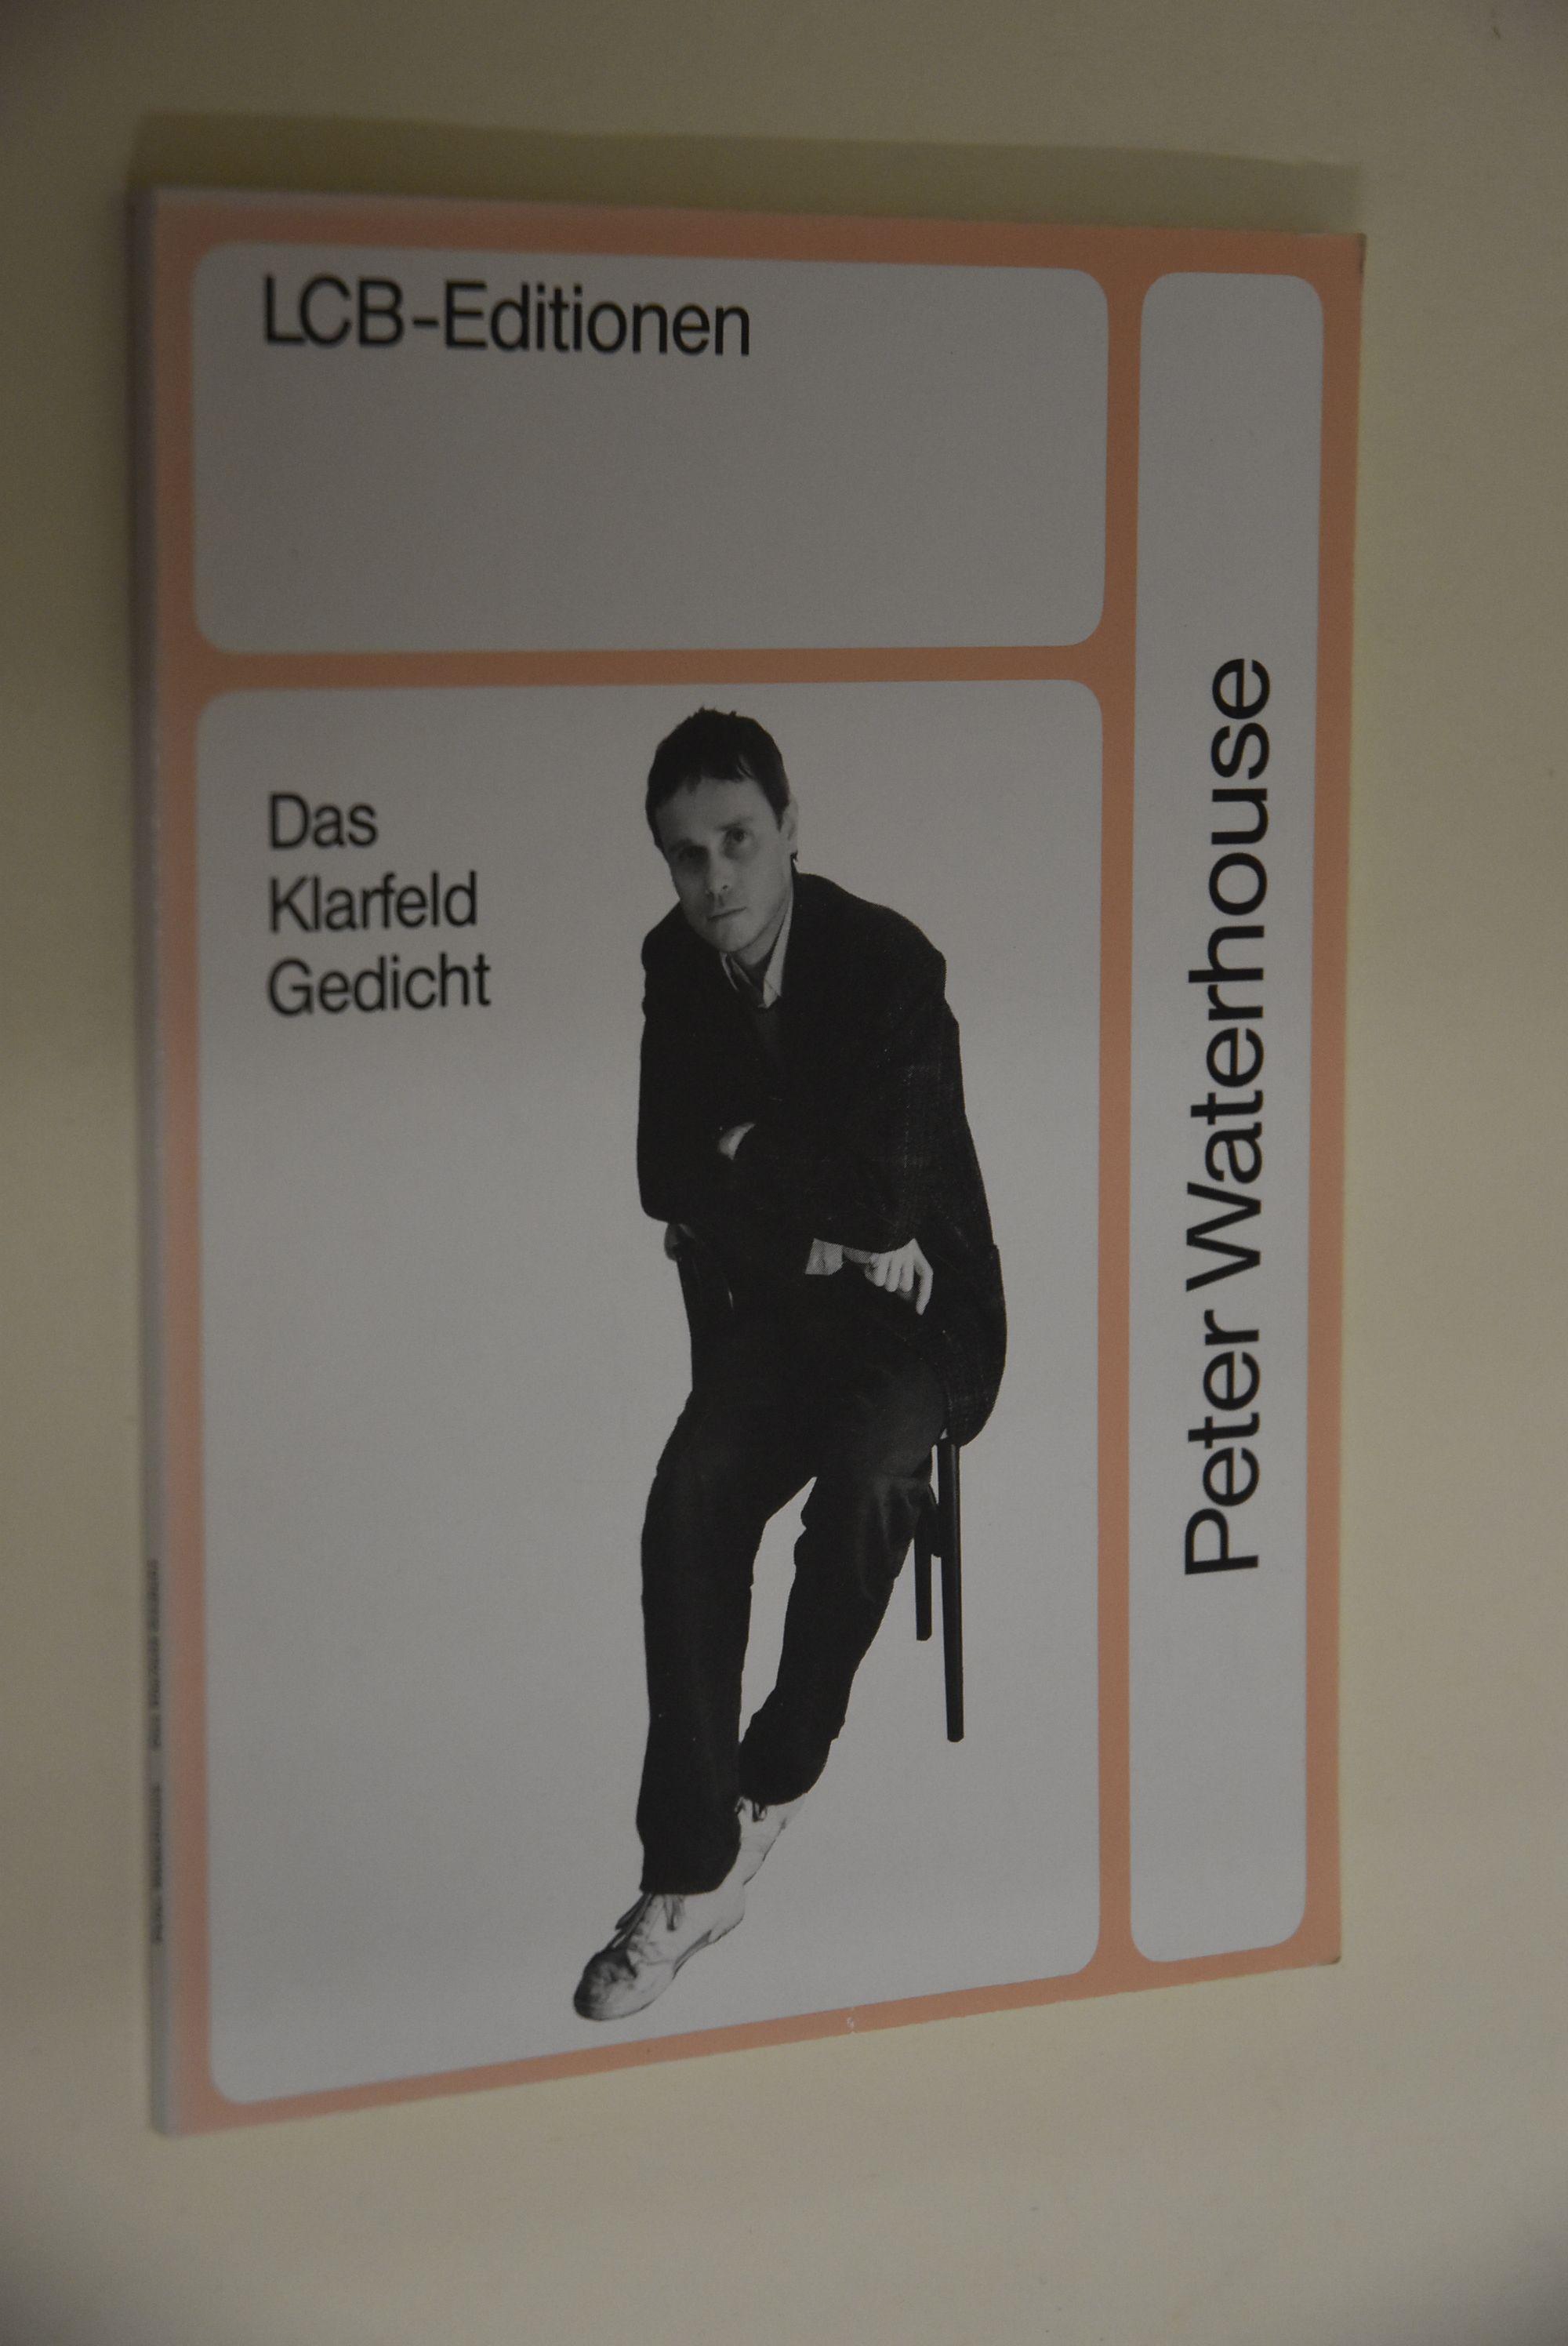 Das Klarfeld Gedicht.: Waterhouse, Peter: